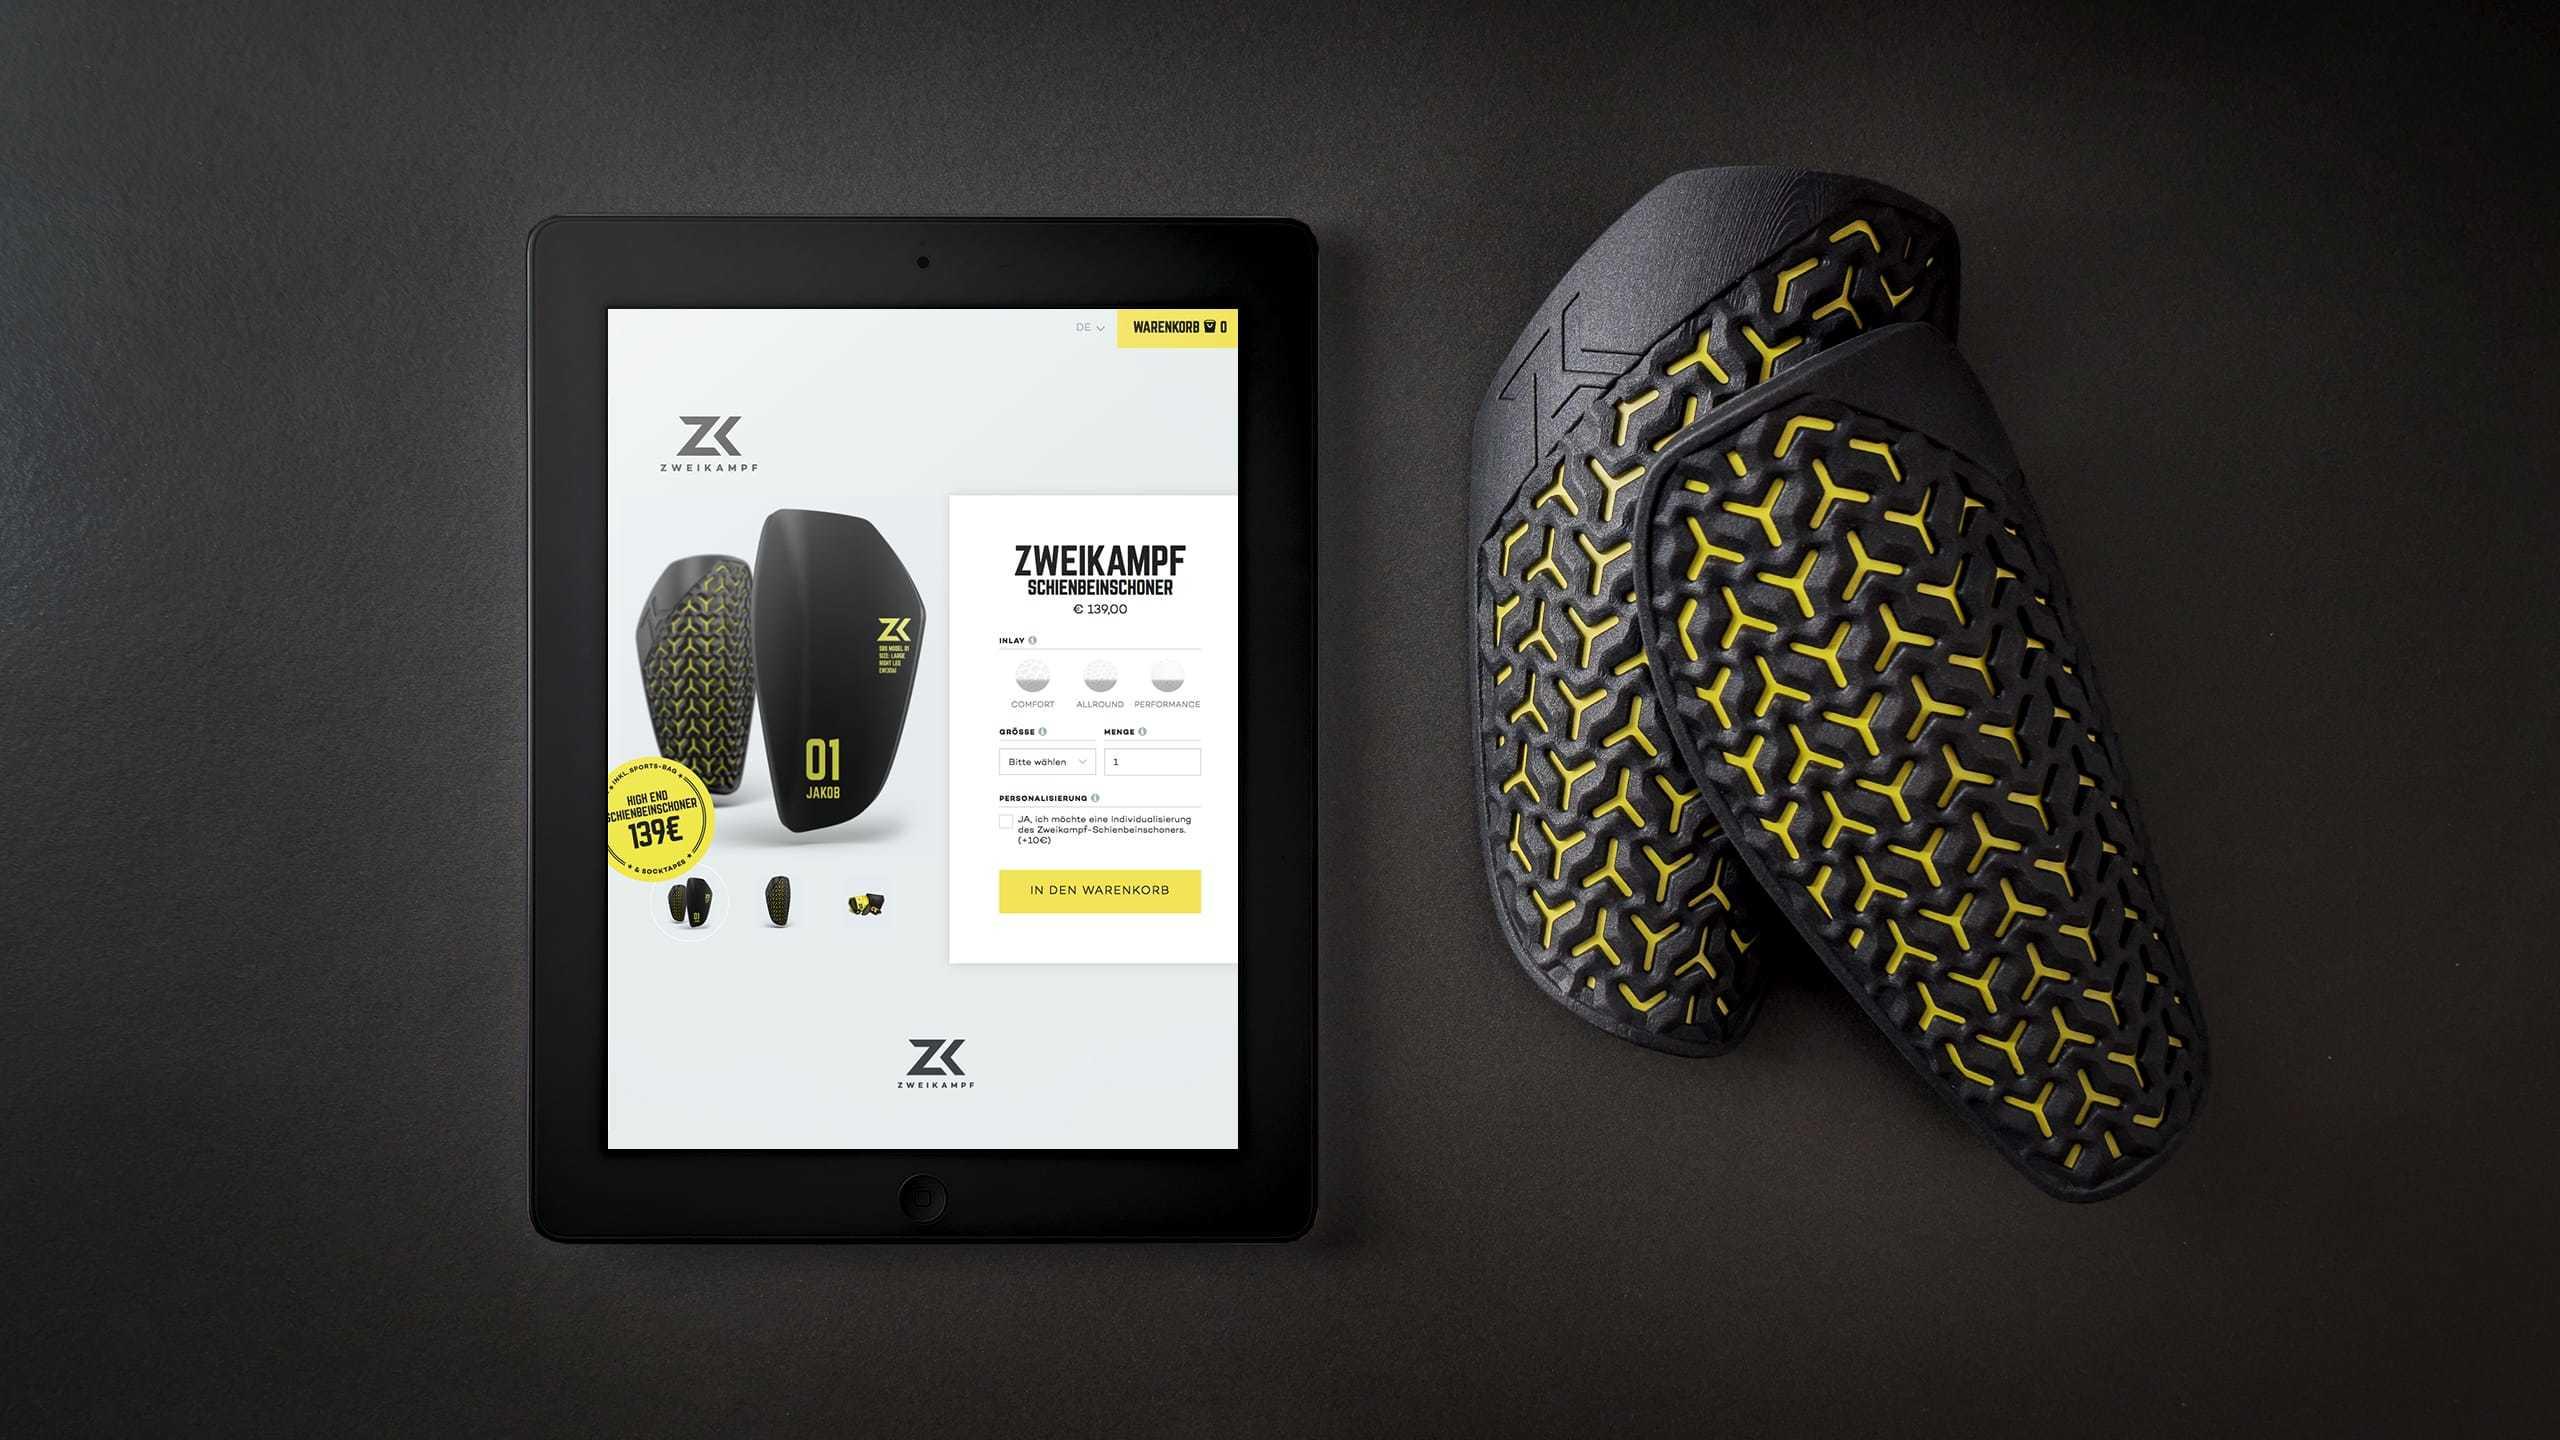 Ref Zweikampf Webdesign Ipad